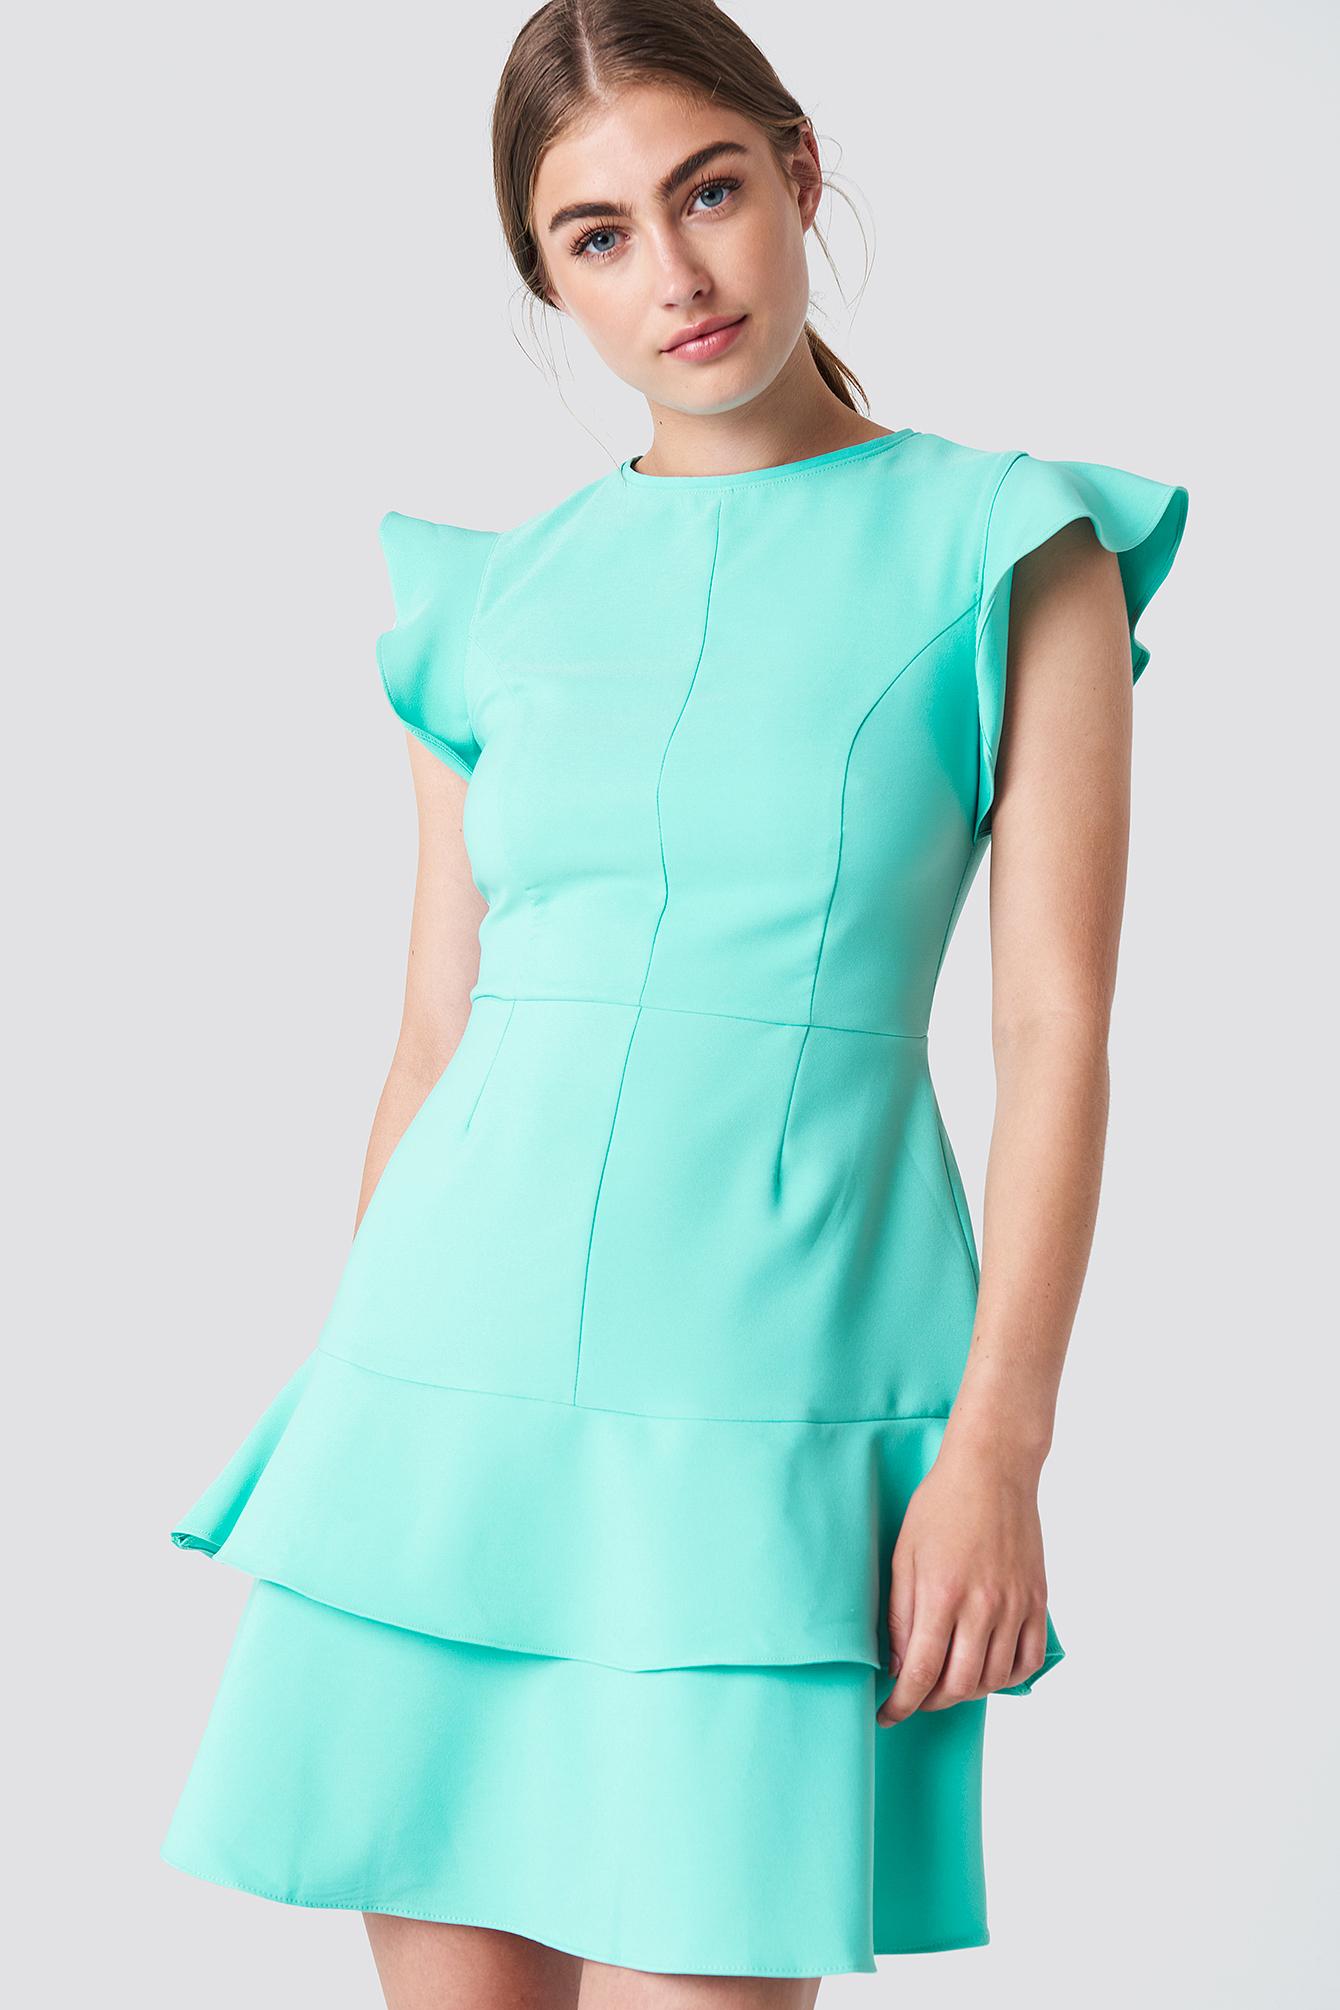 Flounce Shoulder Mini Dress - Green, Turquoise